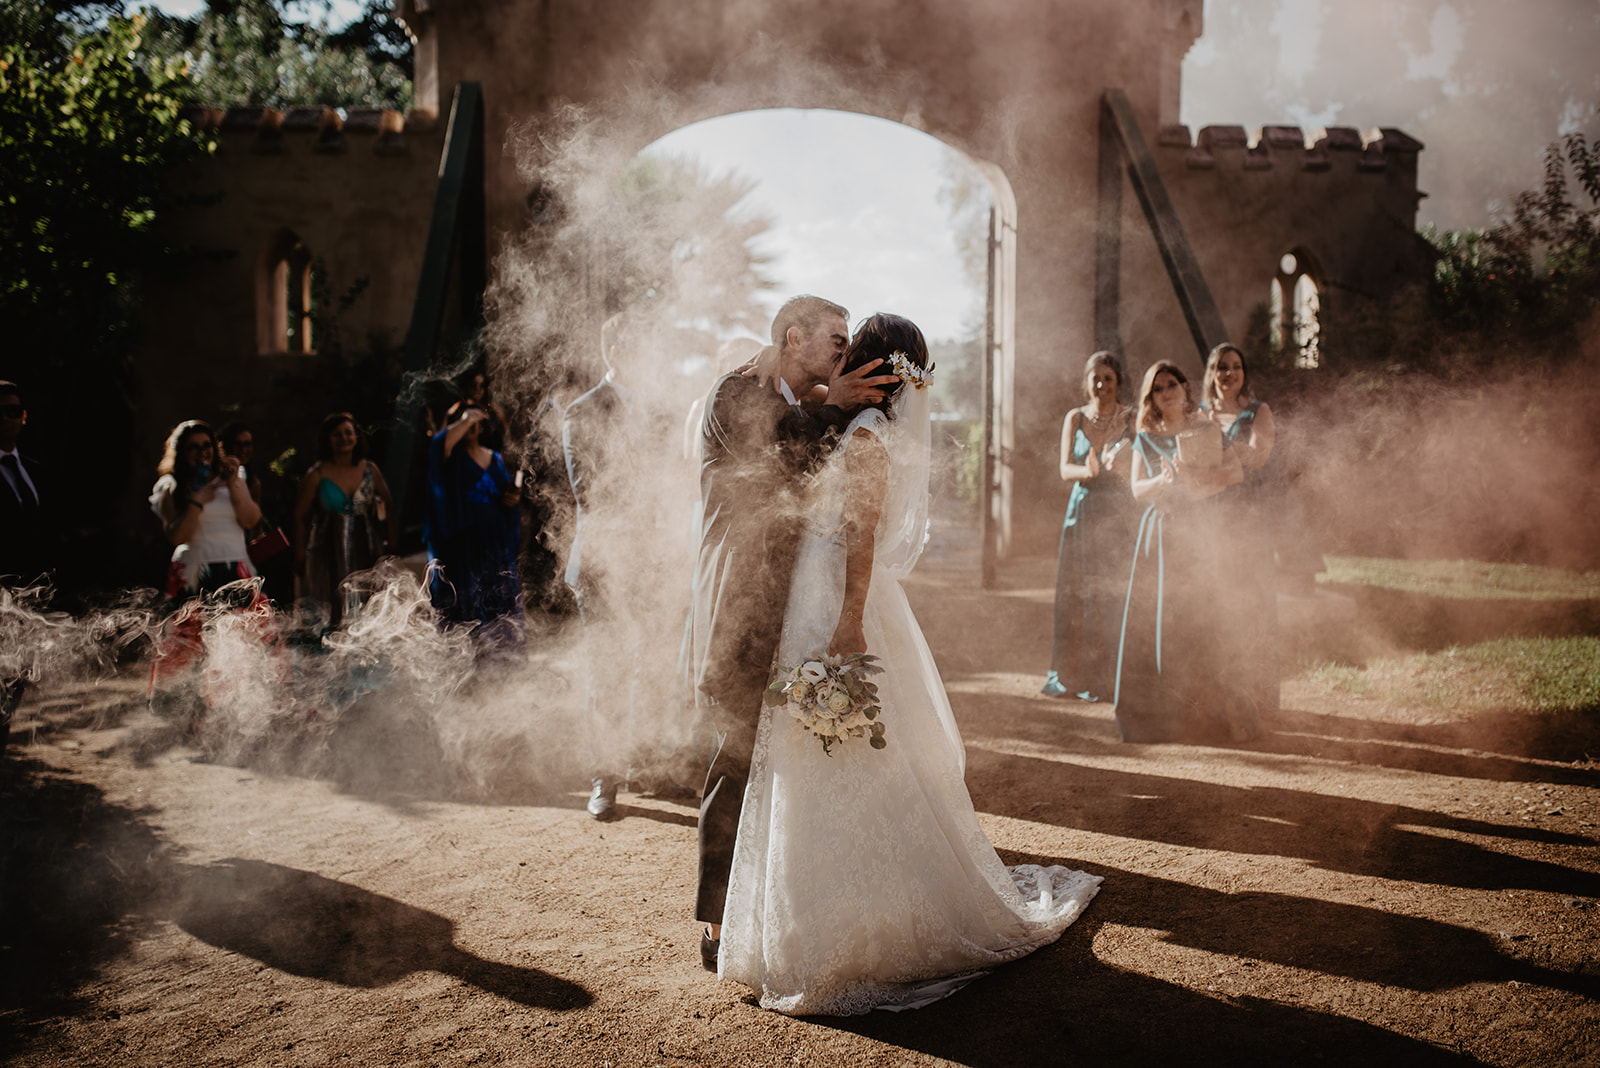 Lapela-photography-wedding-algarve-portugal-best-of-136.jpg